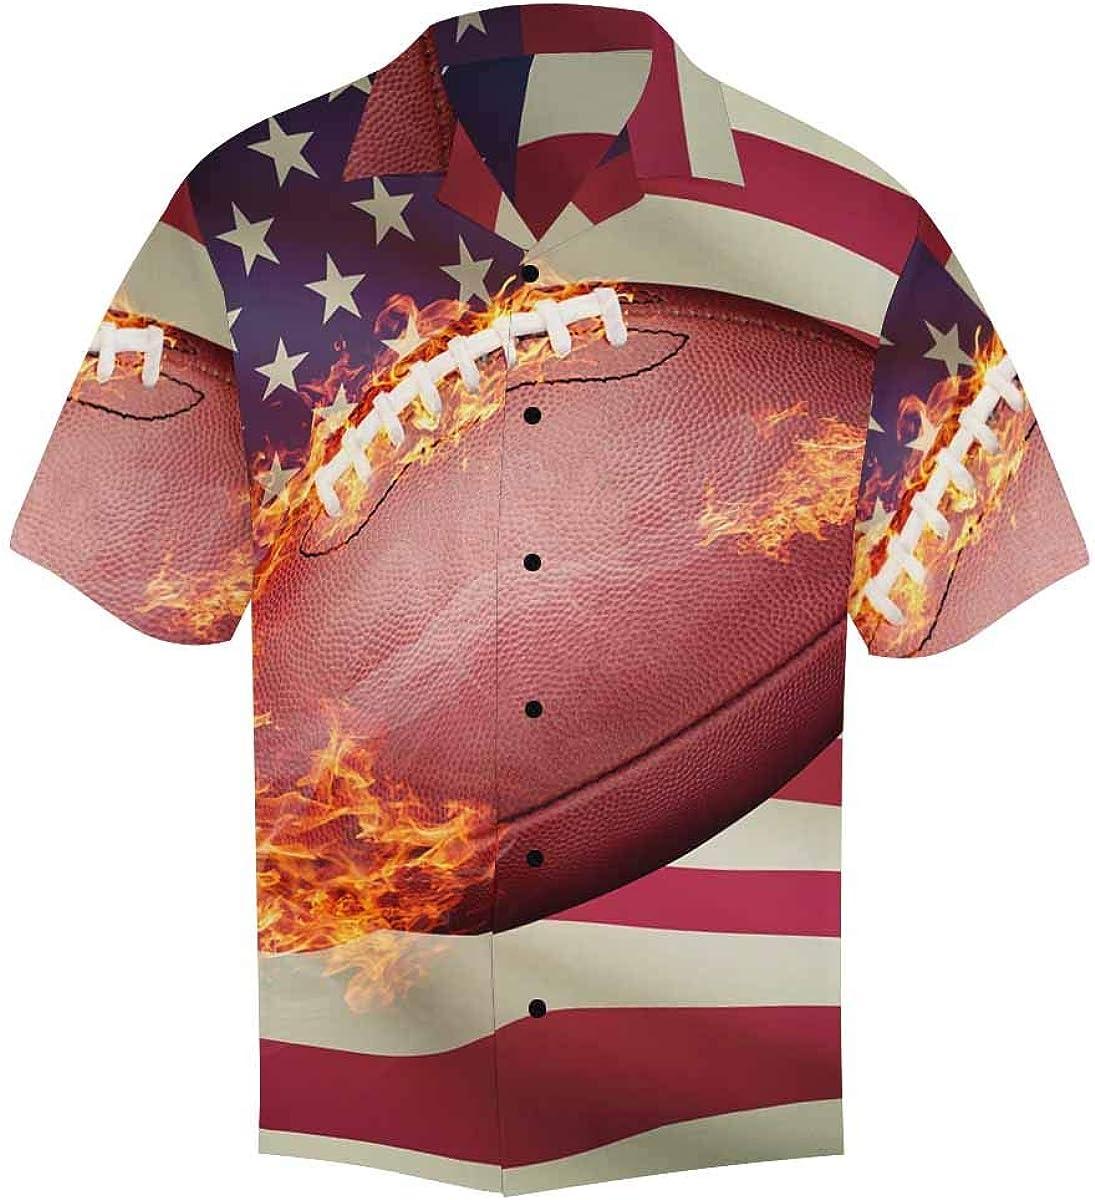 InterestPrint Men's Casual Button Down Sleeve Soccer Short Ball 4 years Many popular brands warranty